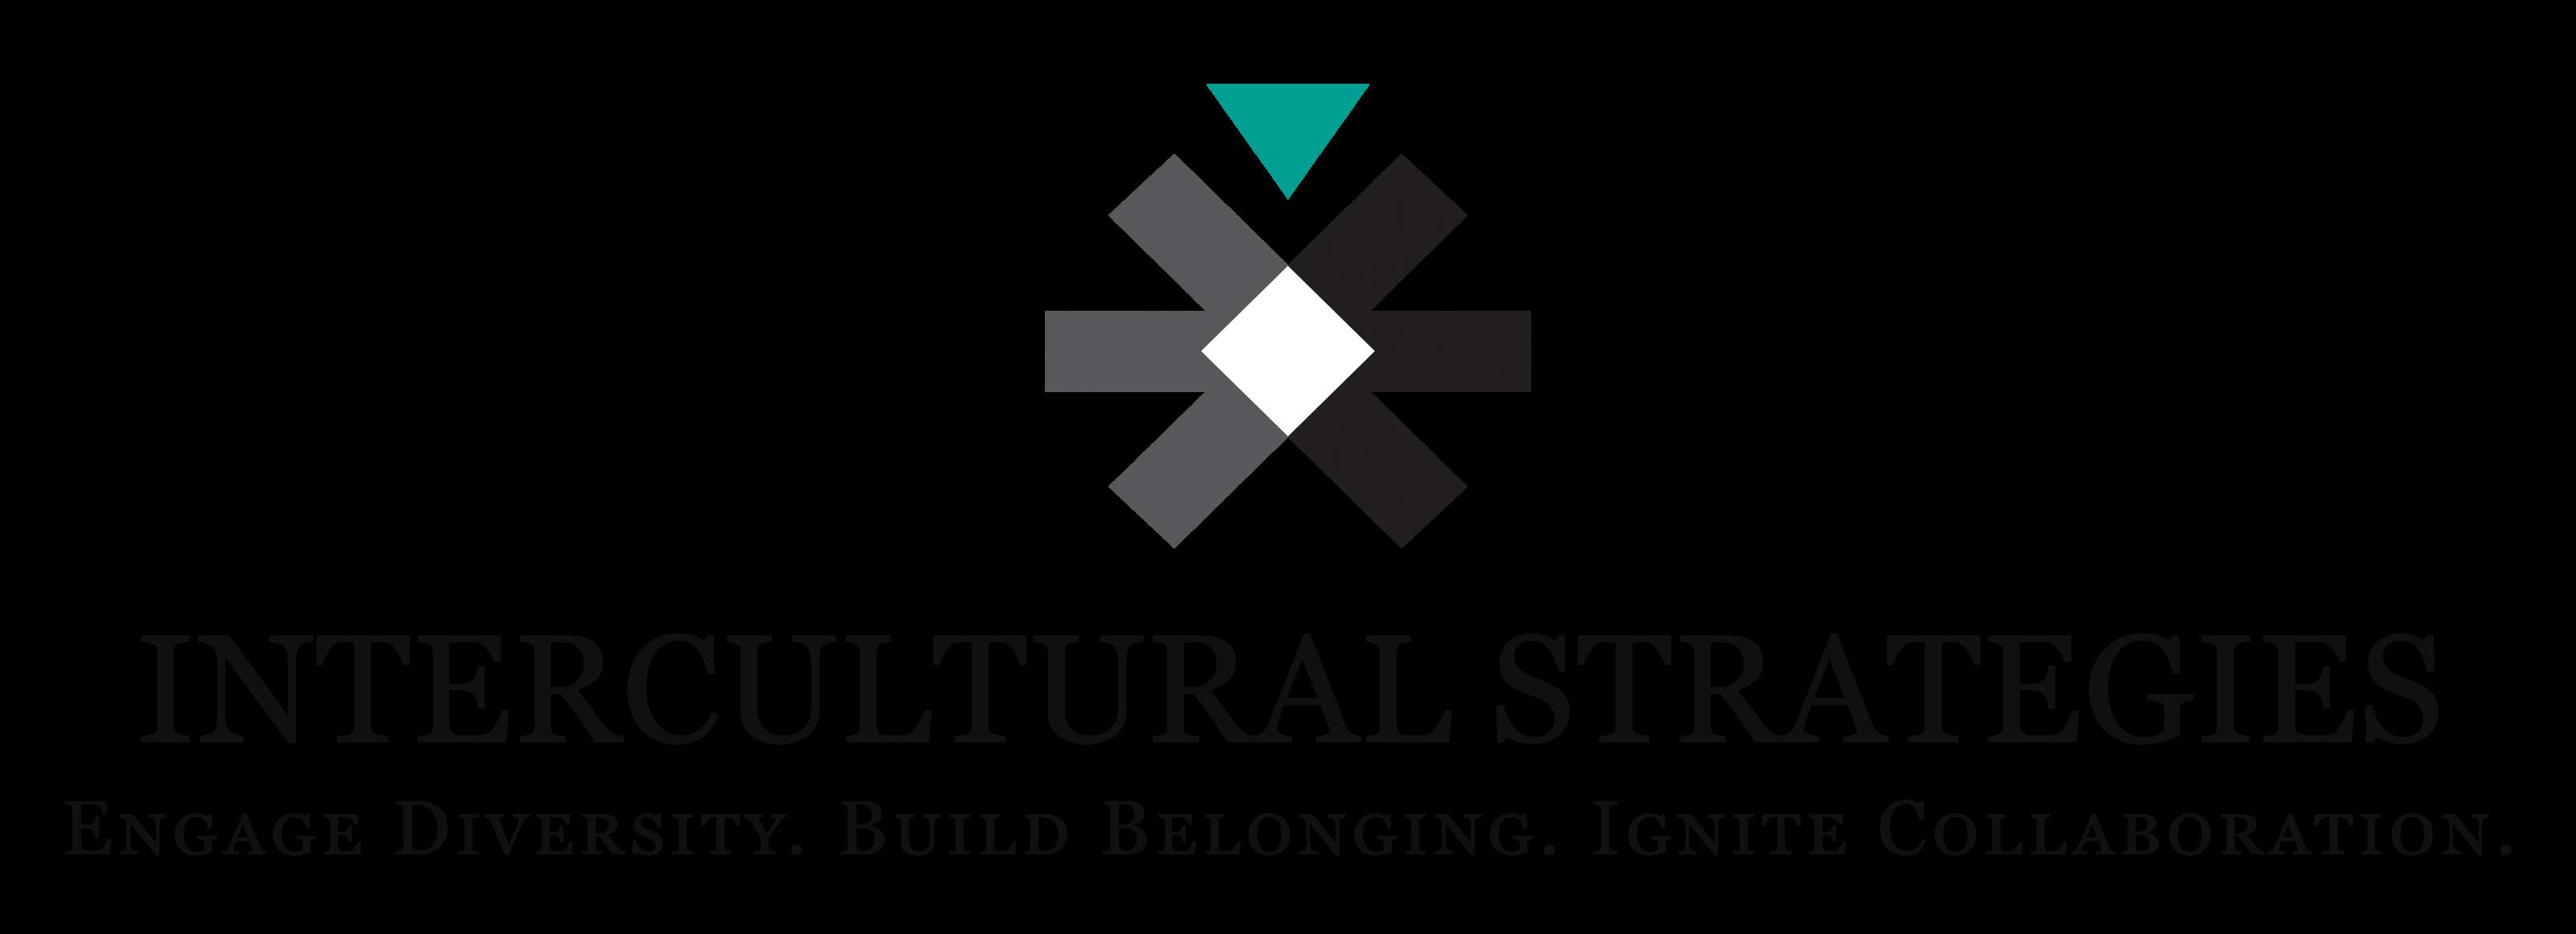 Intercultural Strategies